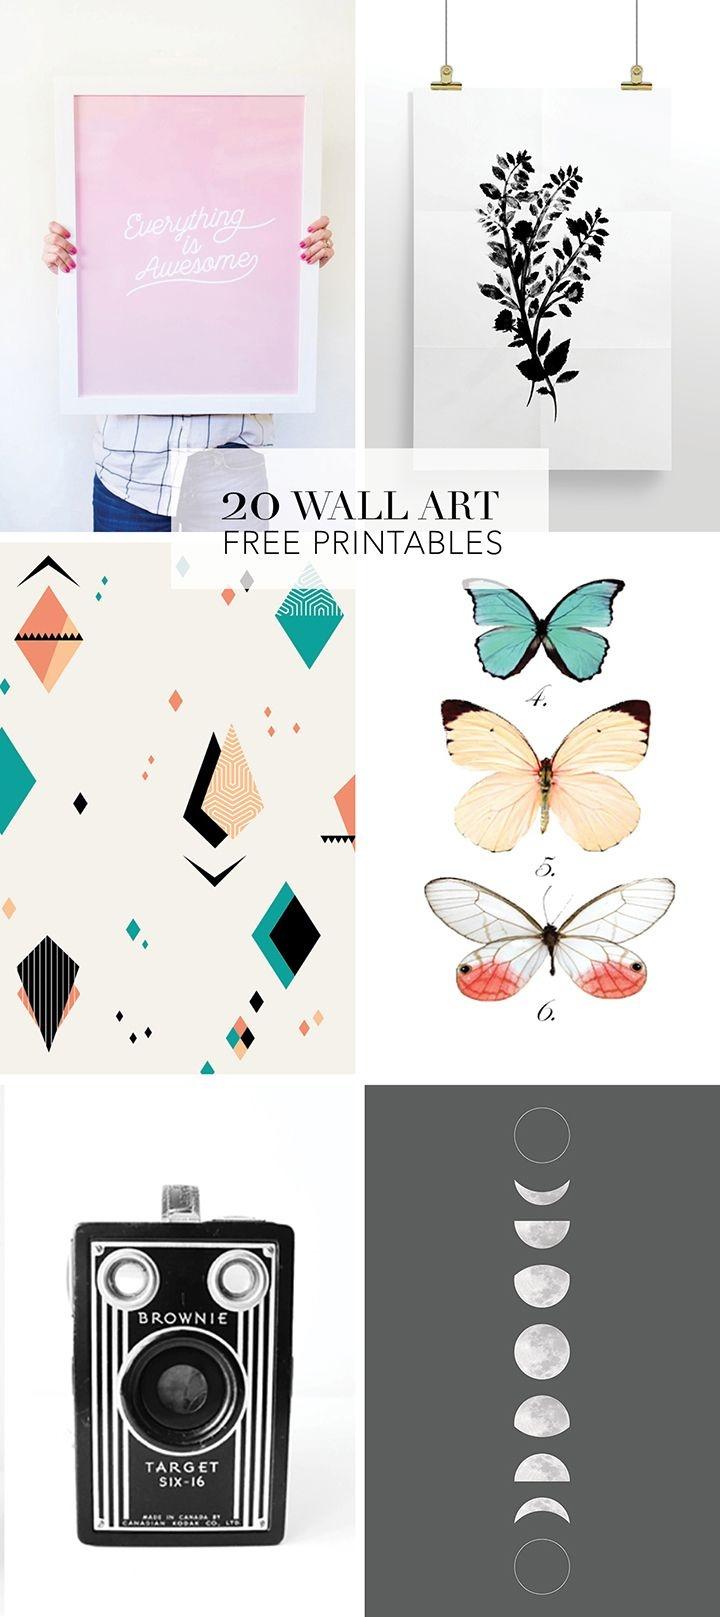 20 Favorite Wall Art Free Printables   Diy Wall Decor   Printable - Free Printable Art Pictures